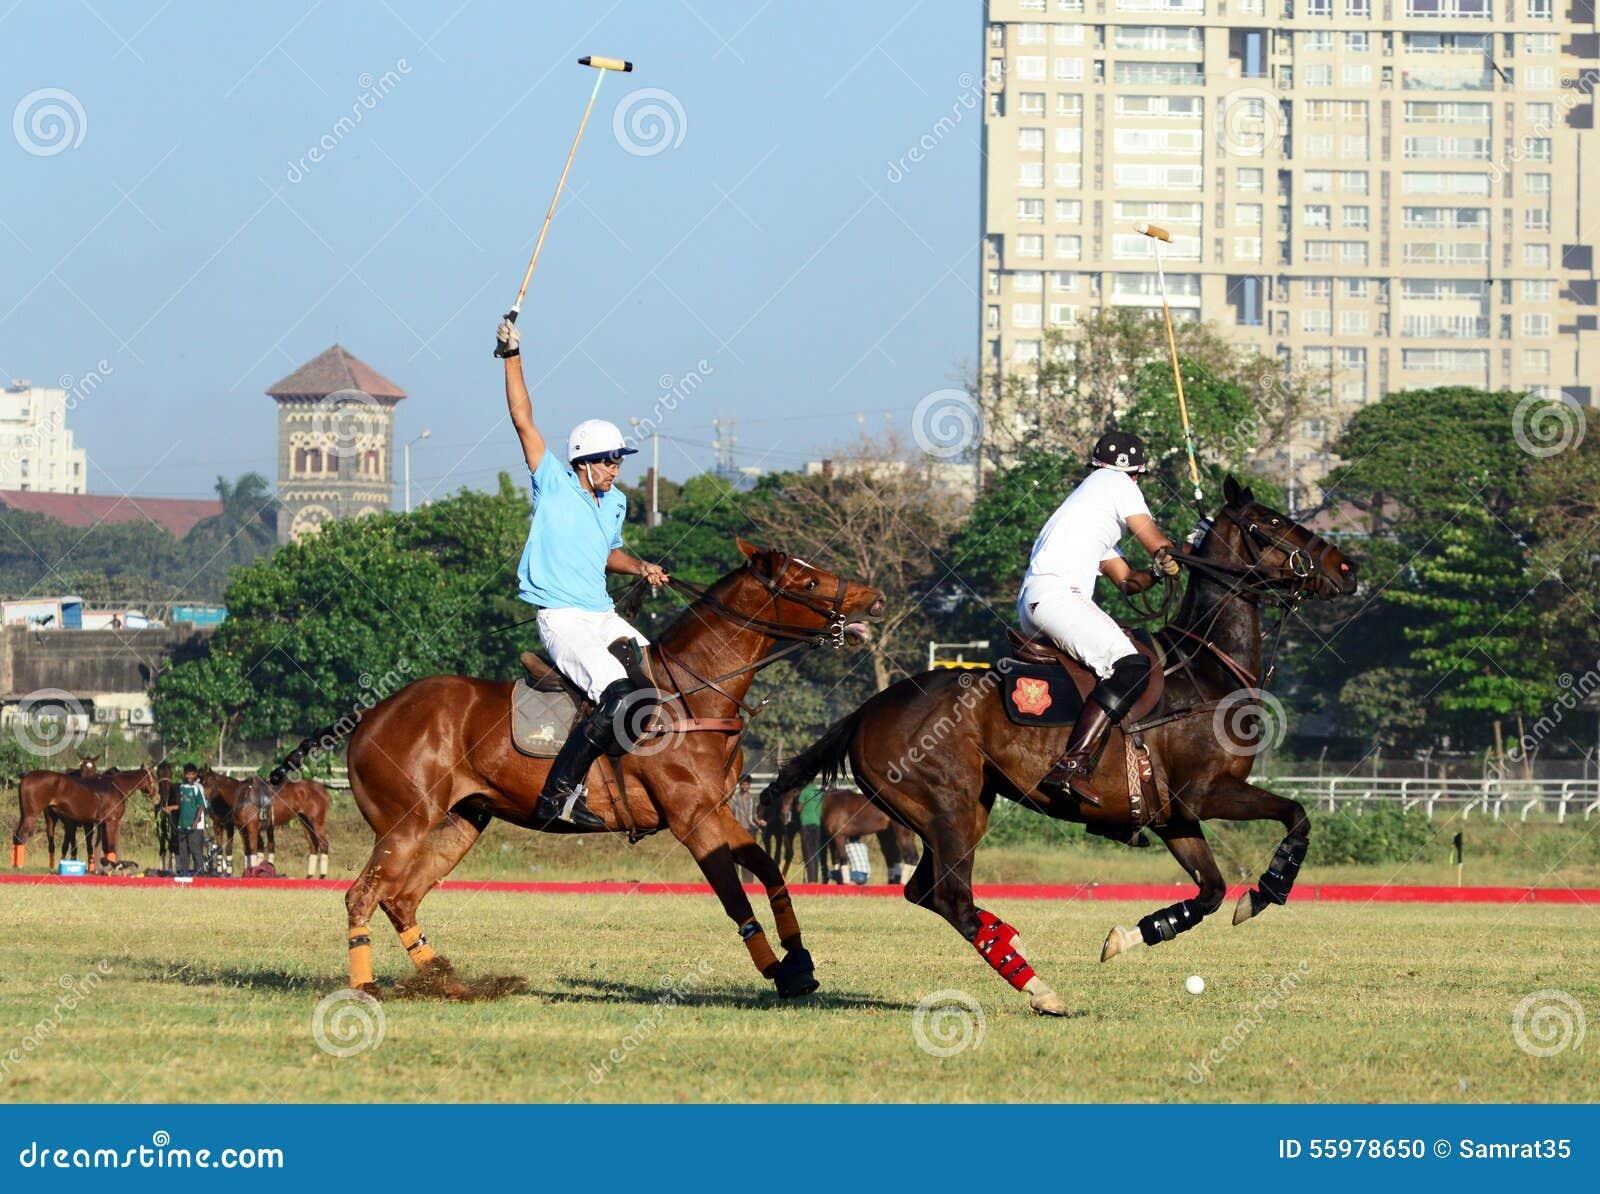 Polo In Mumbai